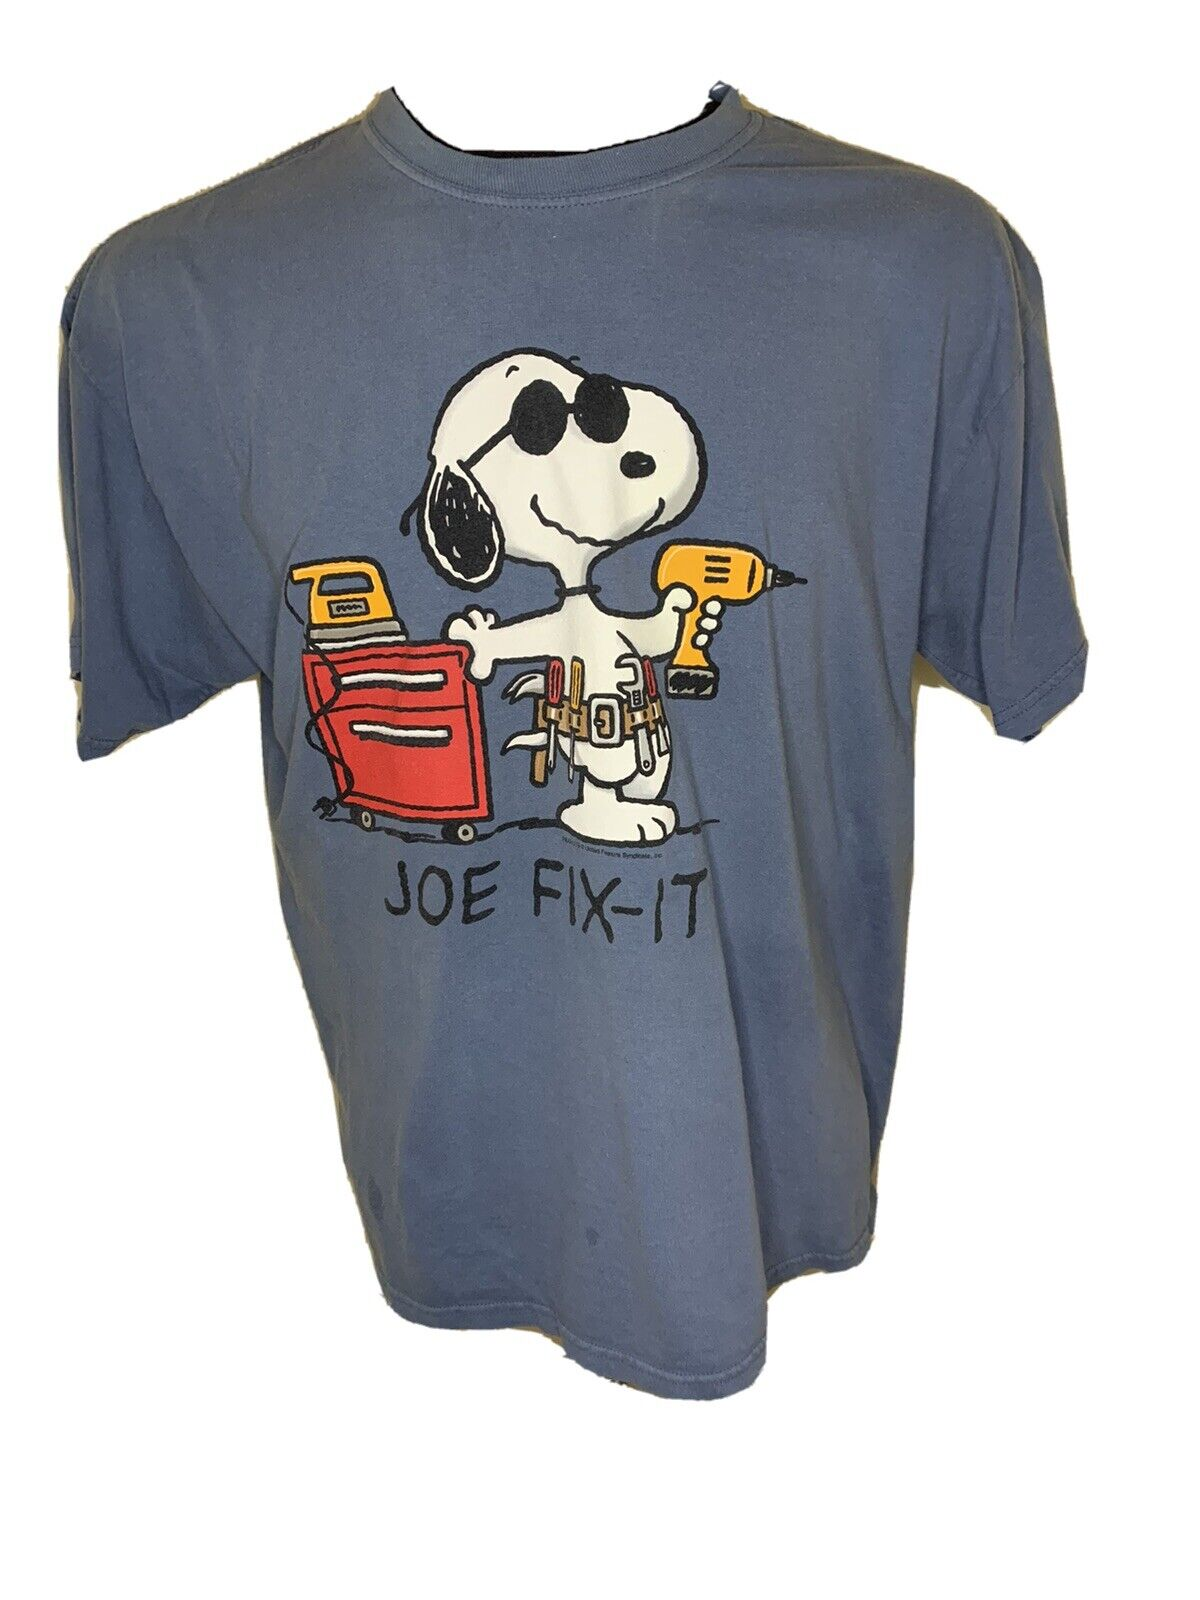 $115 Peanuts Men/'S Blue Snoopy Graphic Short-Sleeve Crew-Neck Top T-Shirt L